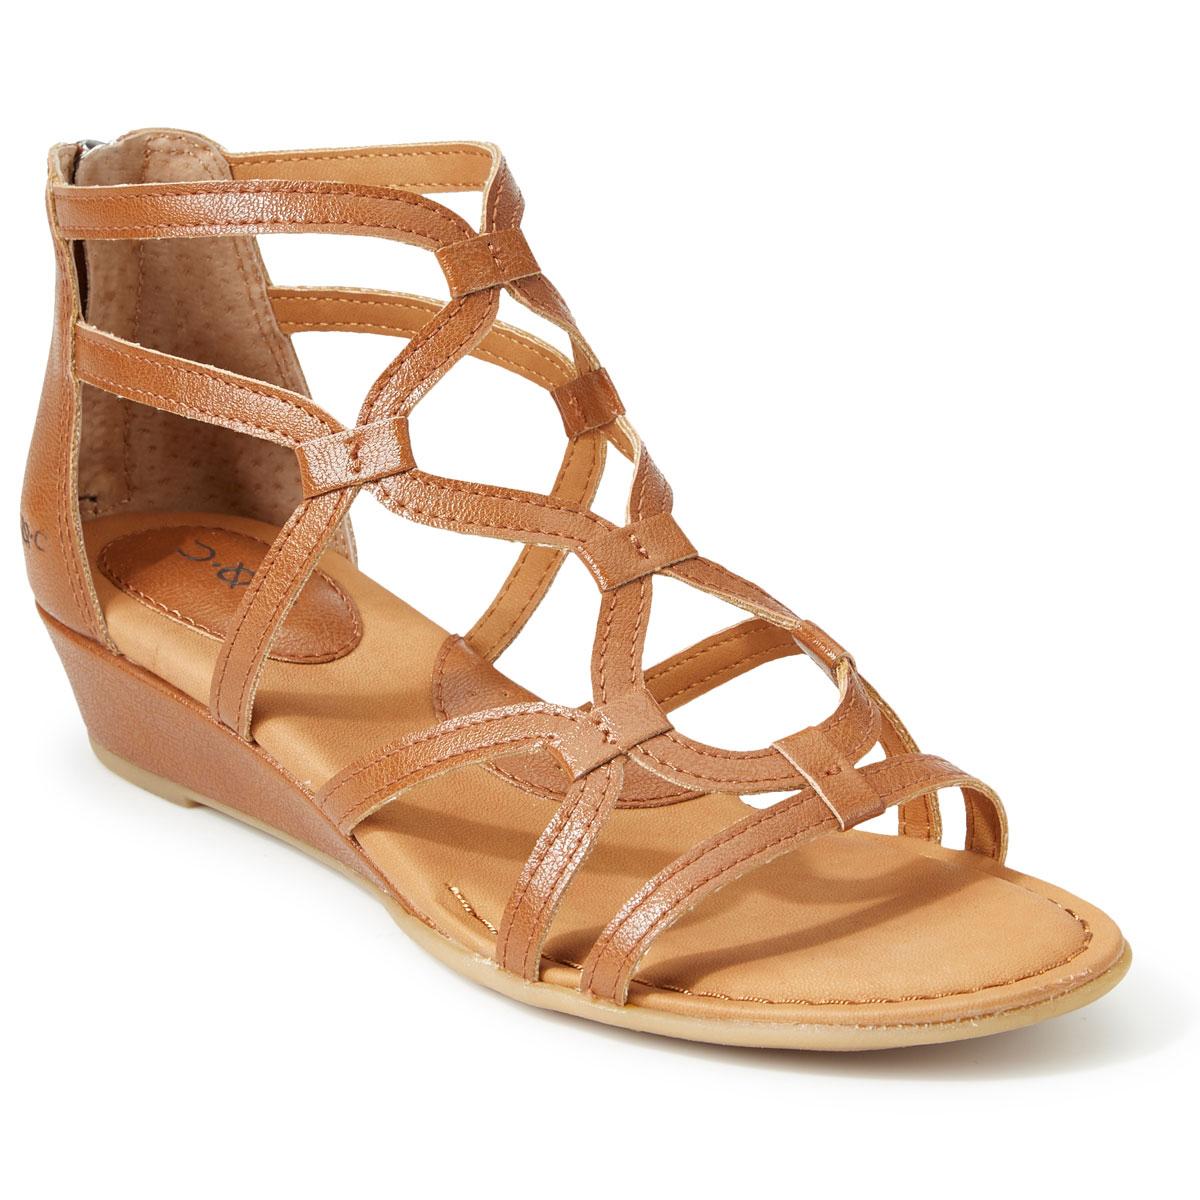 B.O.C. Women's Pawel Demi-Wedge Sandals